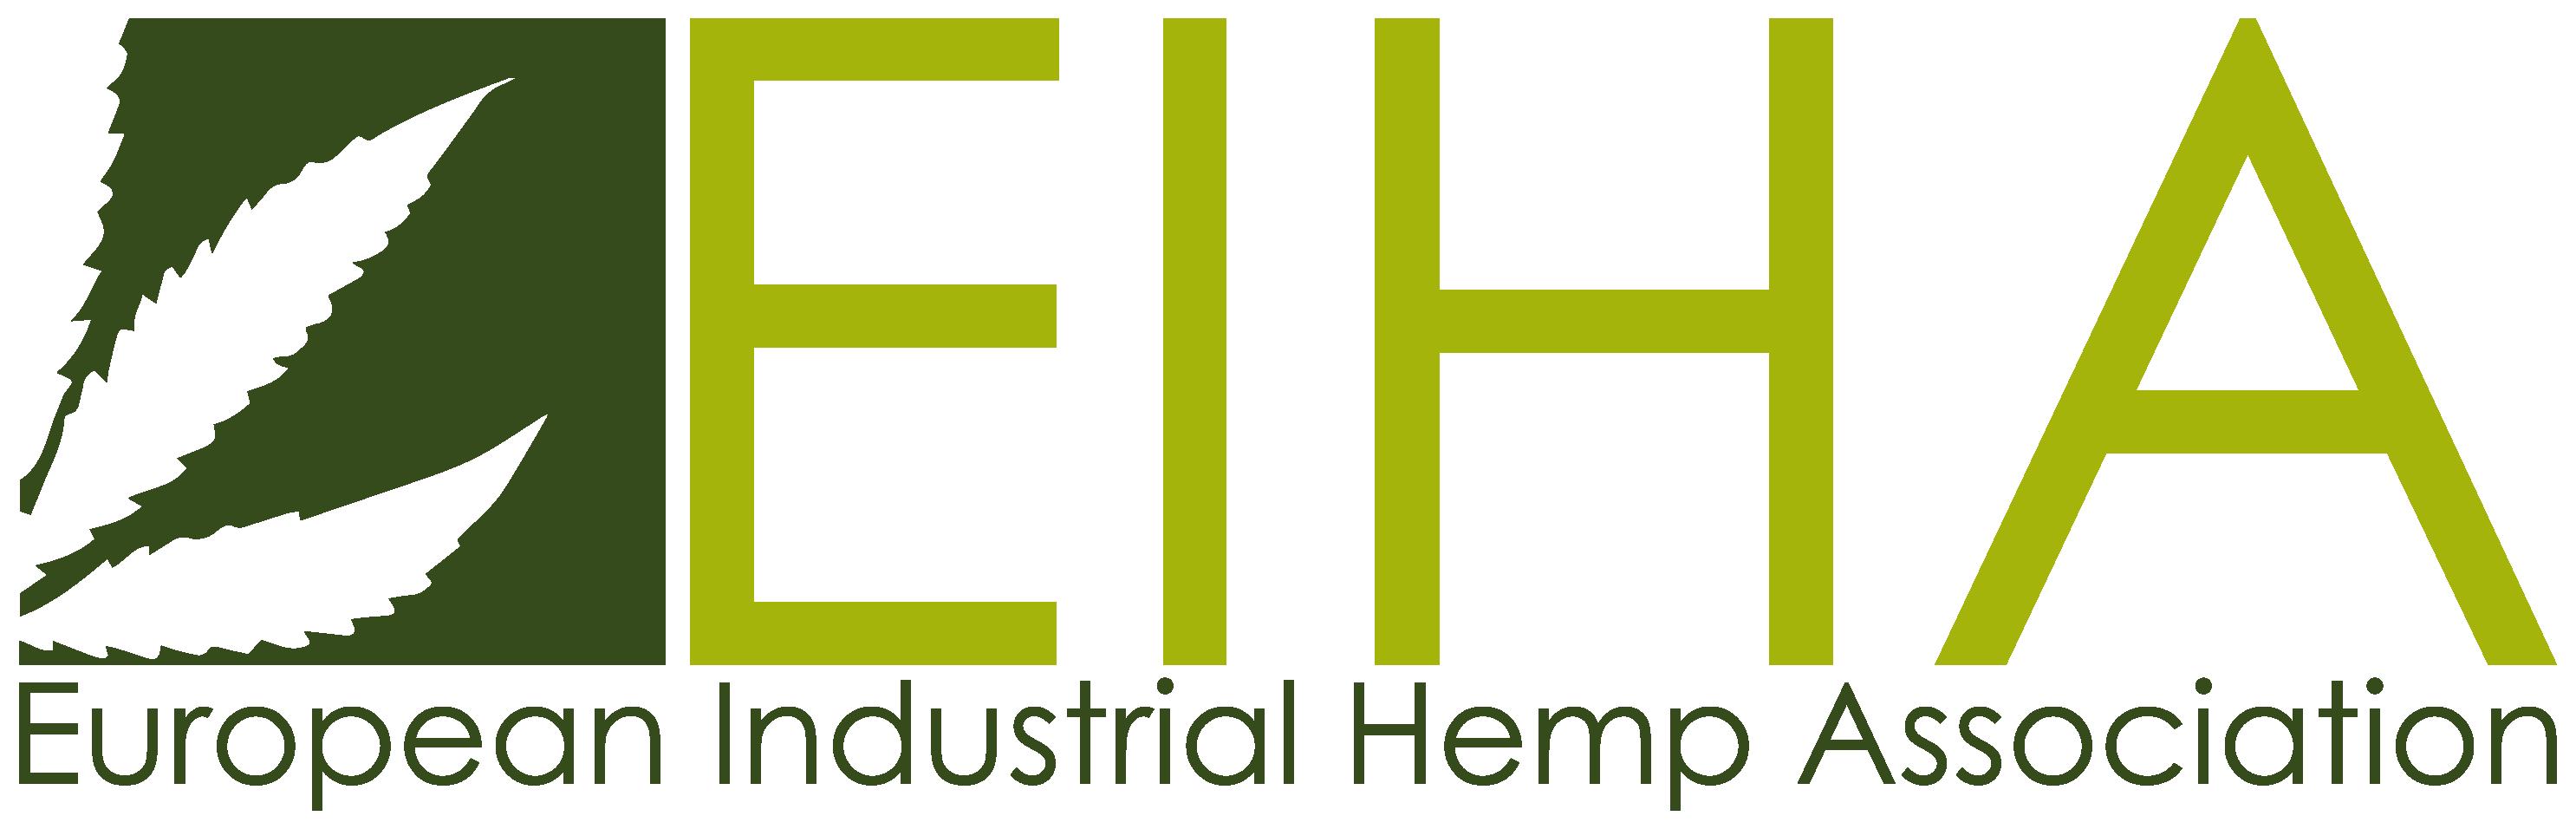 European Industrial Hemp Association Logo